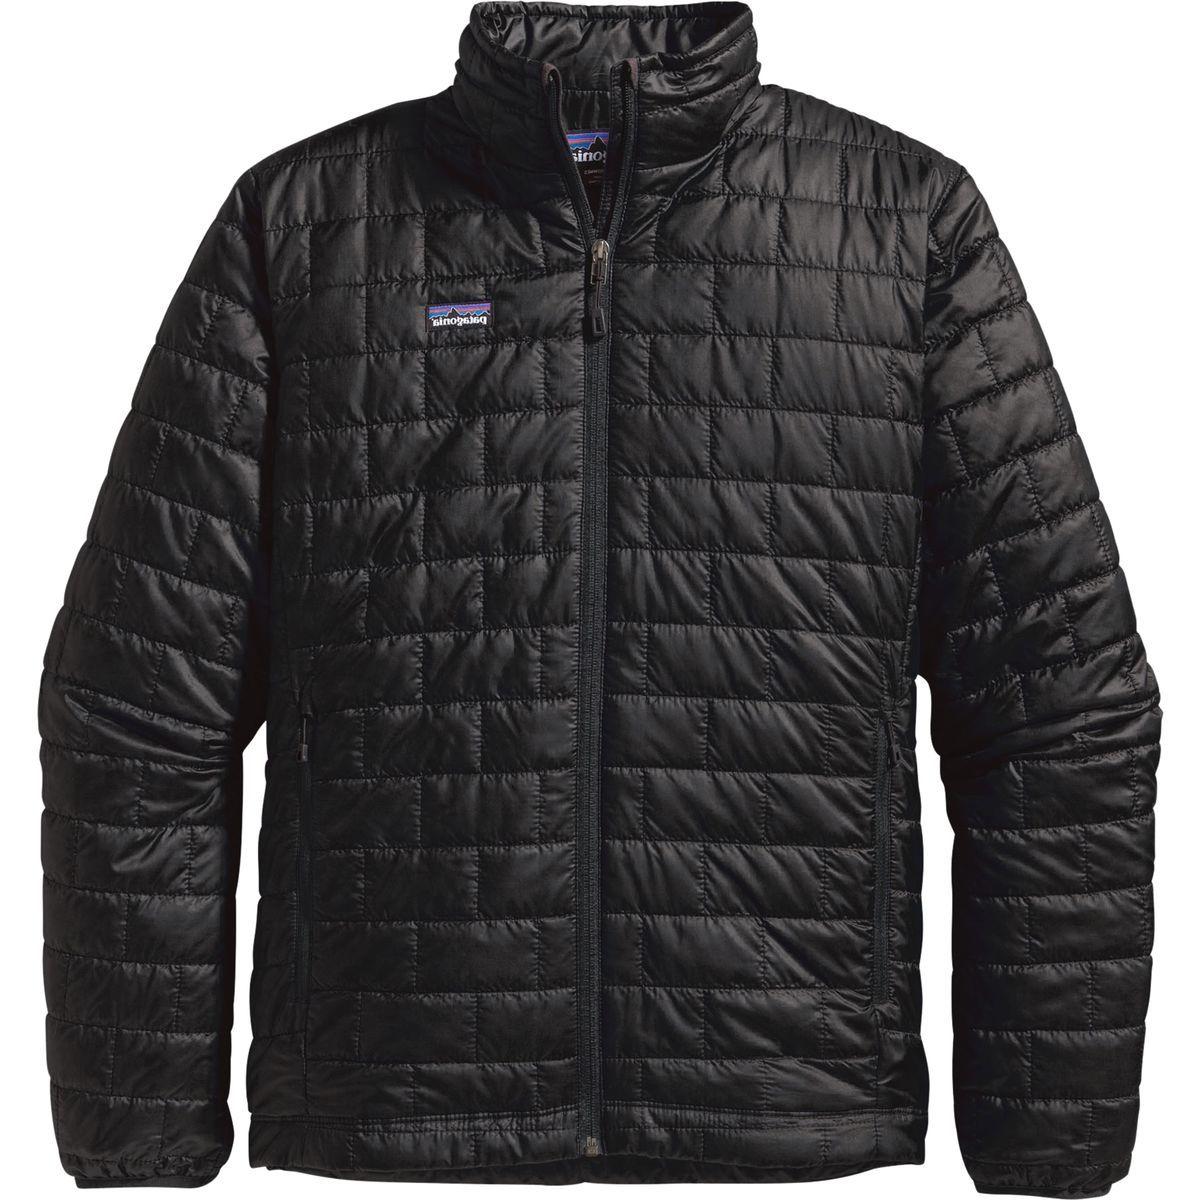 Patagonia Nano Puff Insulated Jacket - Men's